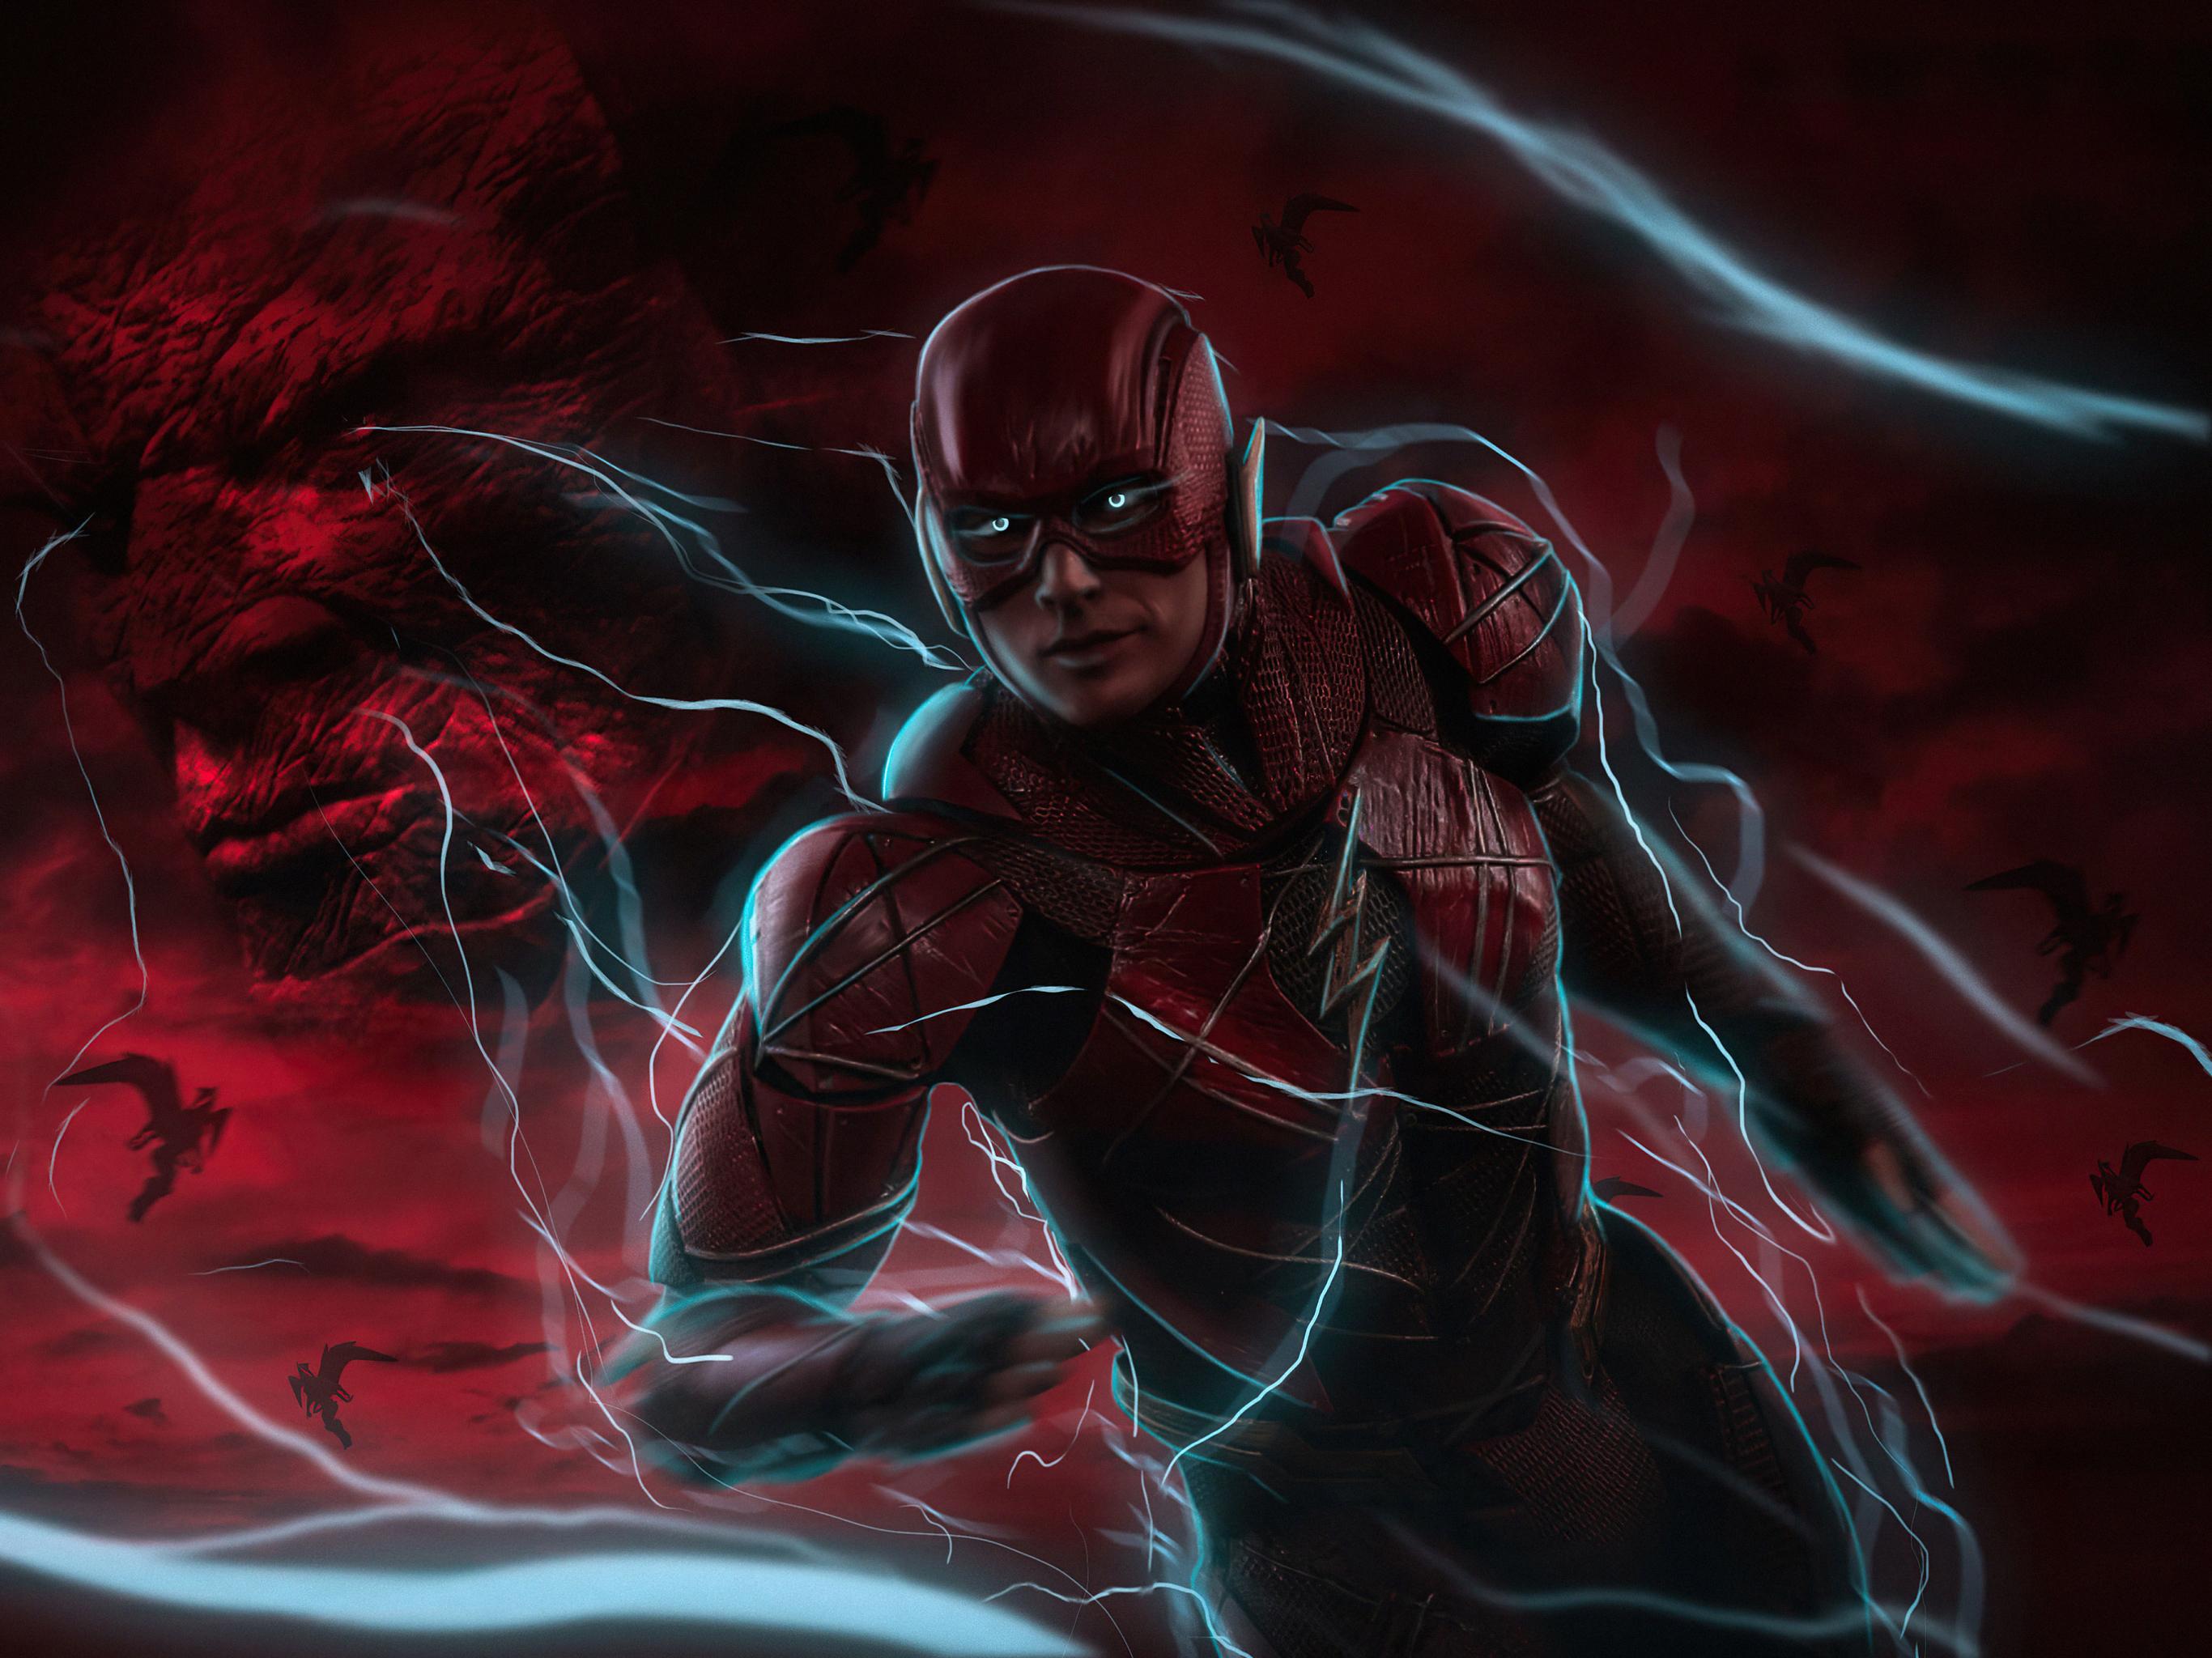 2732x2048 Cool Flash Art 2732x2048 ...